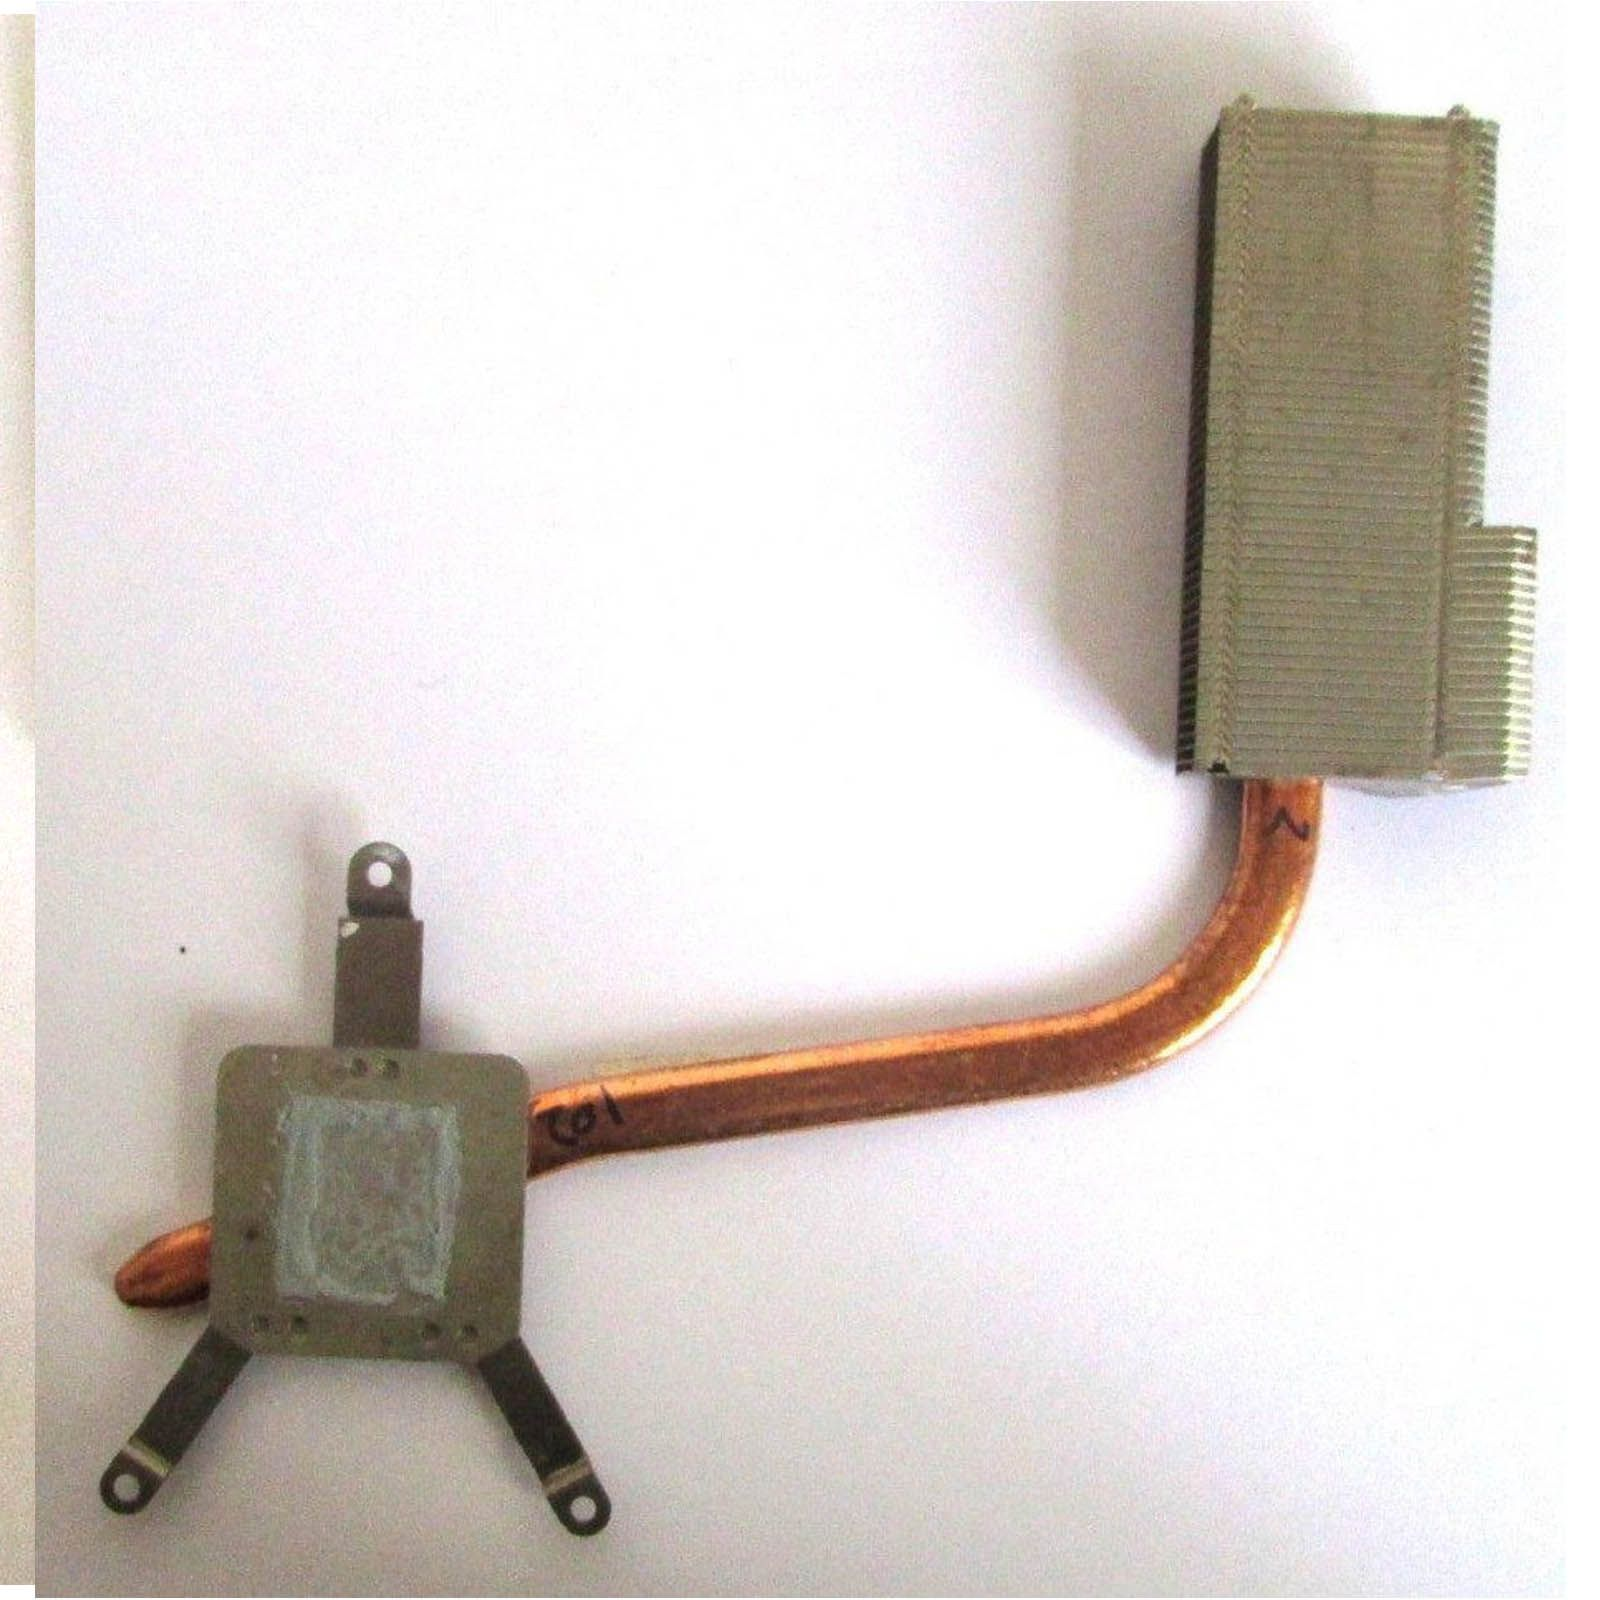 Disipador Notebook Cce I25 PN: 49R-1C14CU-0401 - Retirado